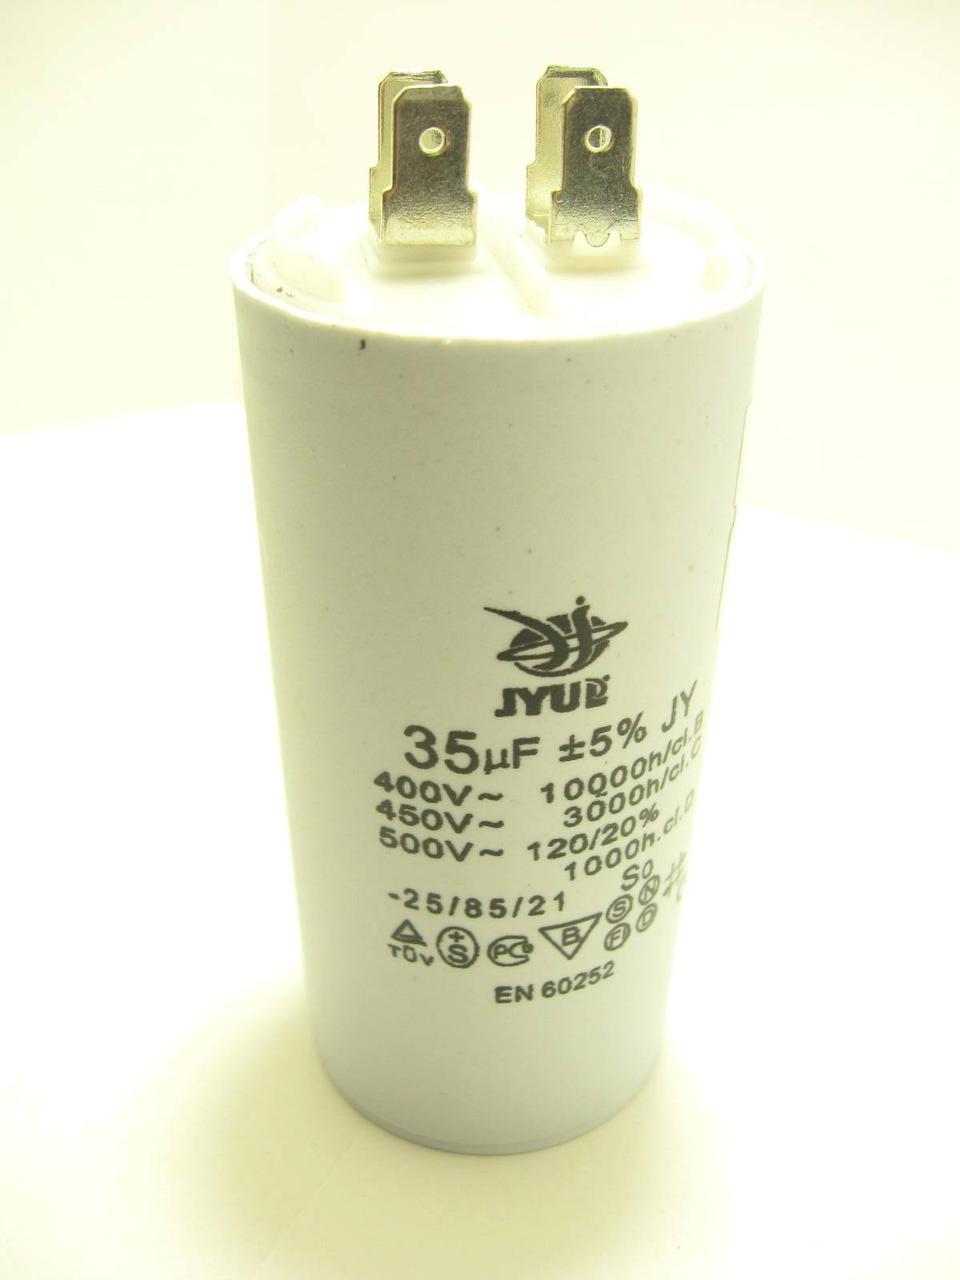 Конденсатор пусковой CBB-60 H 35uF 450VAC 40*90 на клеммах 5мм JYUL